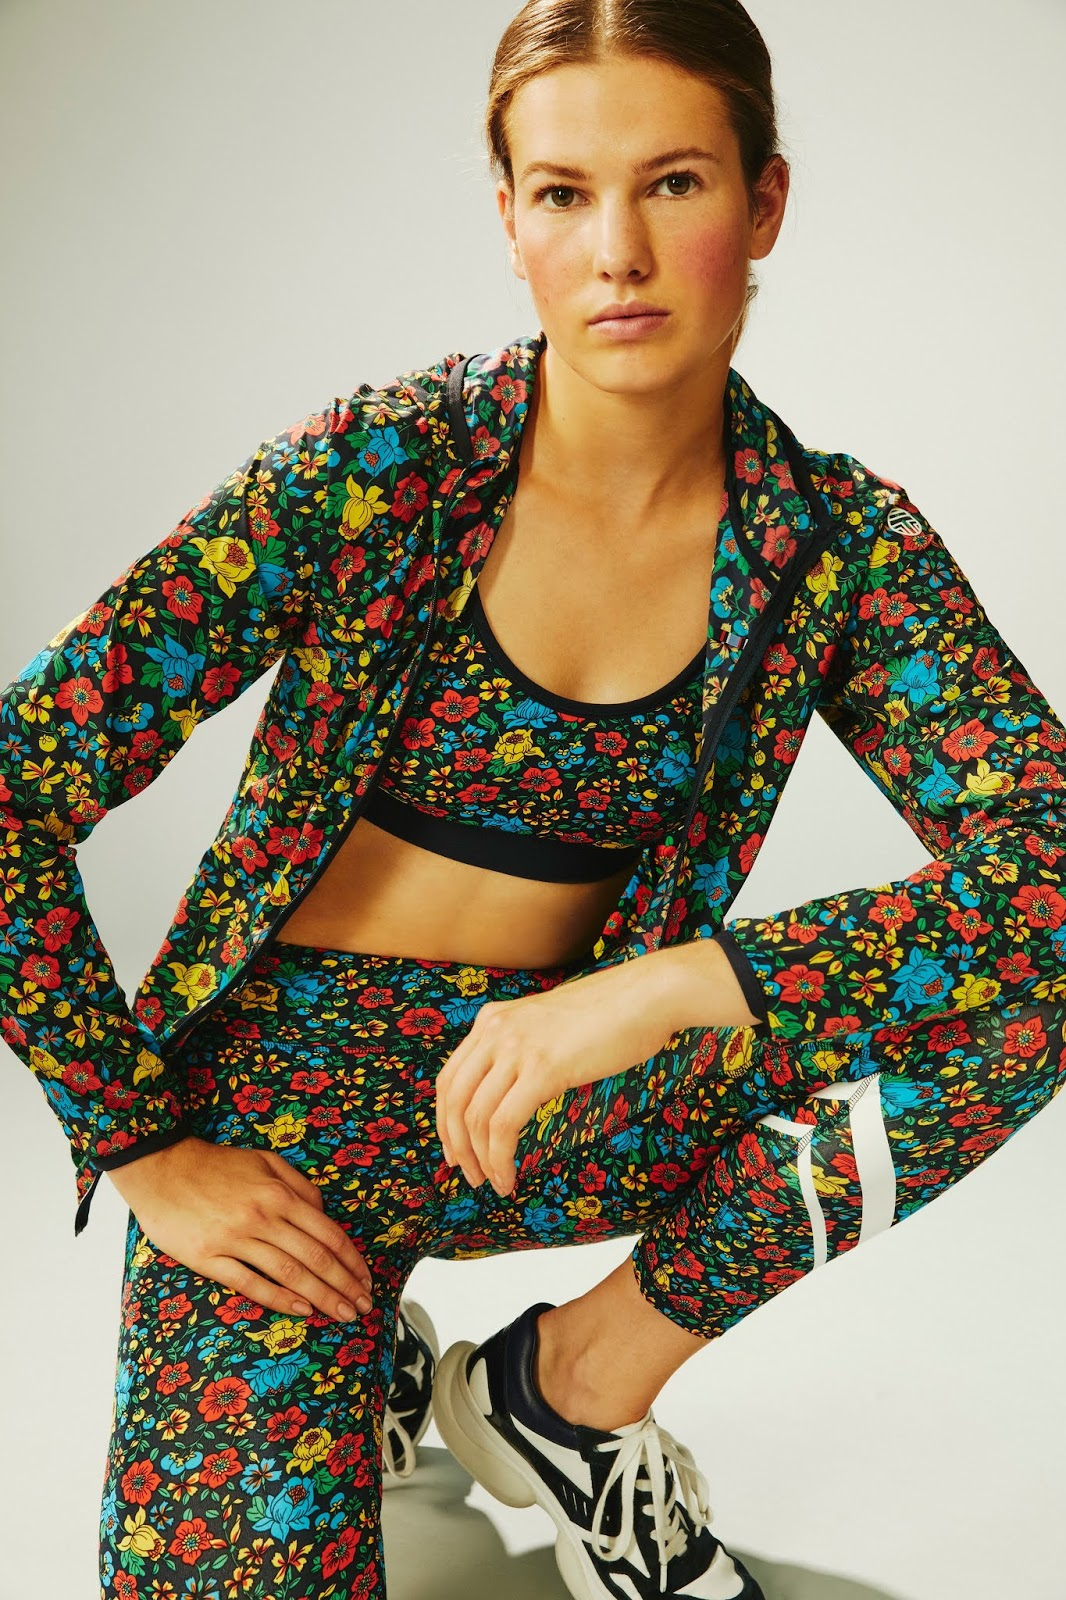 Chic Sportswear by Tory Burch